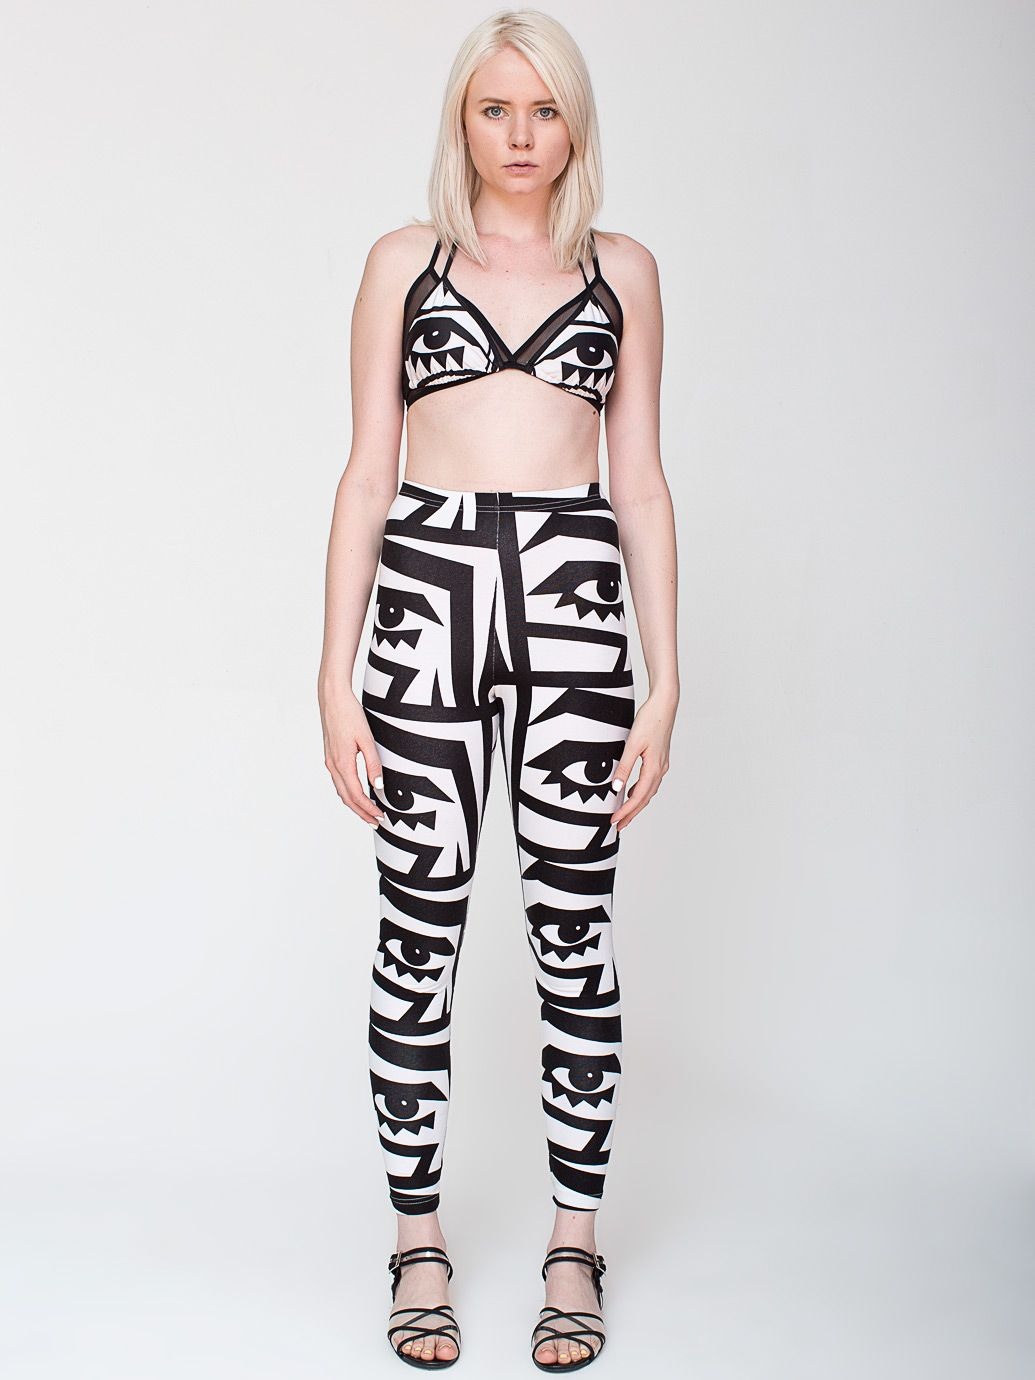 KESH X American Apparel   American apparel, Fashion, Style